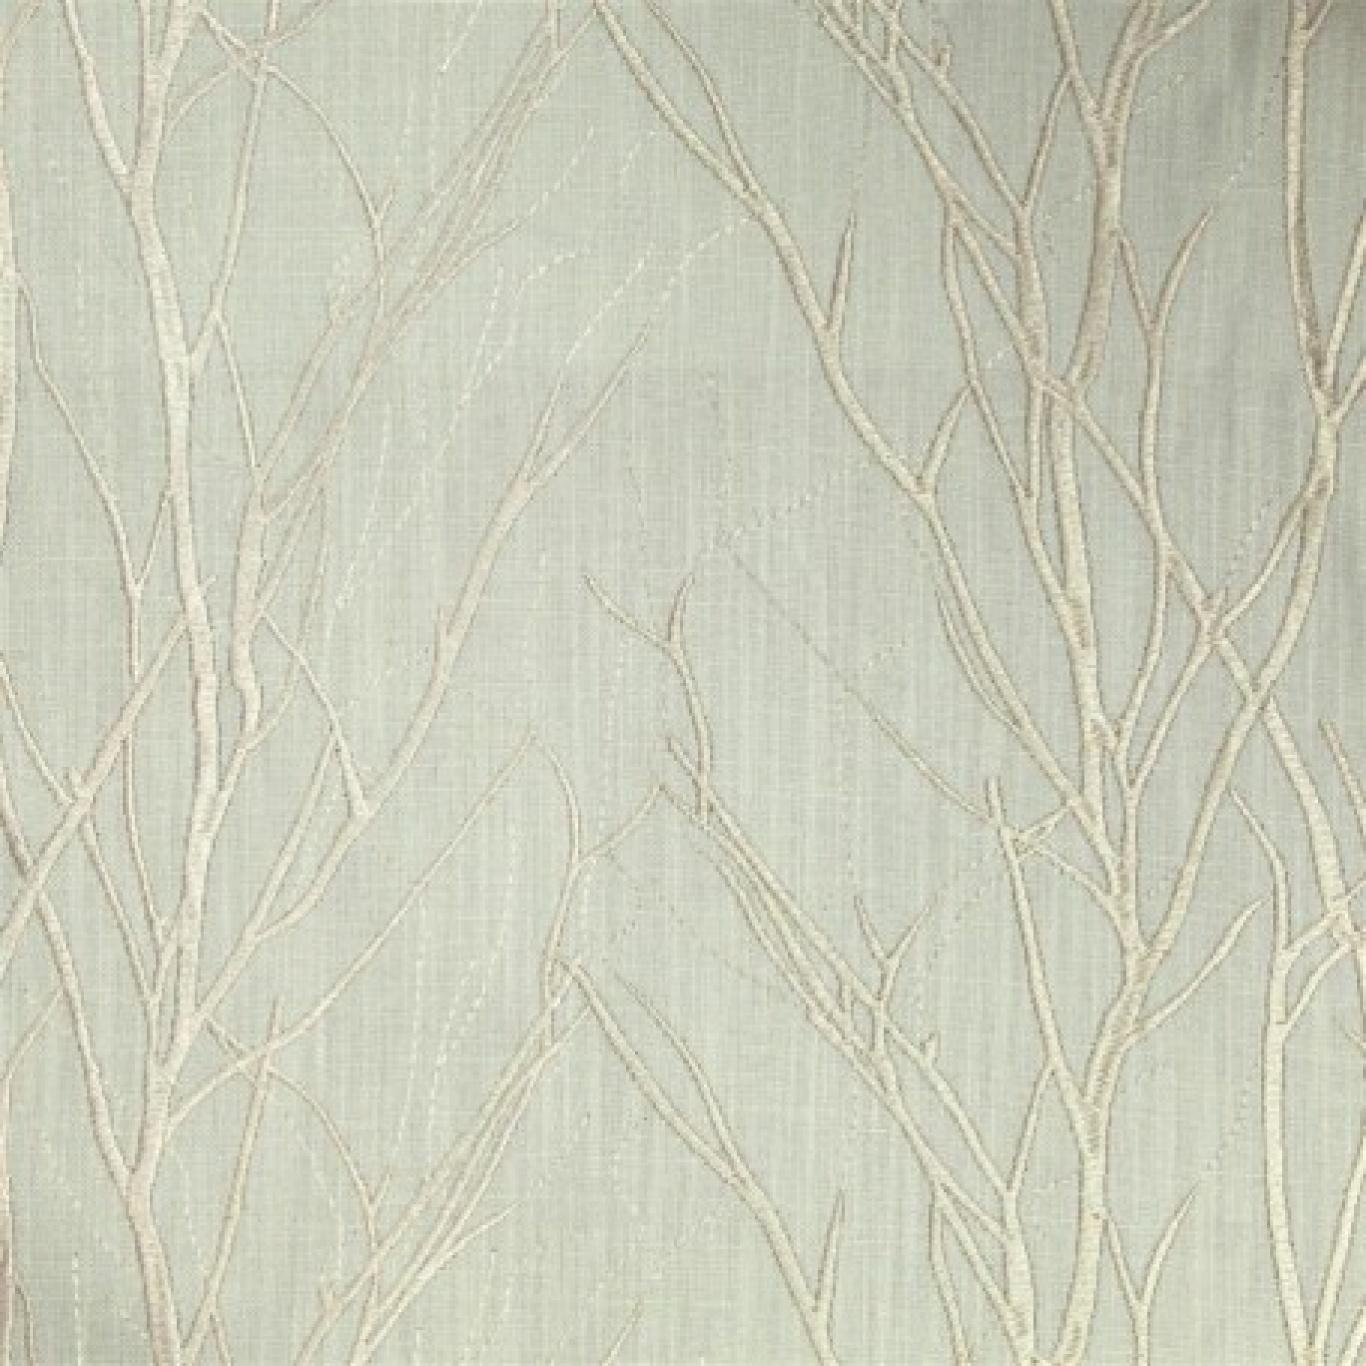 Curtain Fabric Gordon Smith Malvern Ltd Voyage Rowan Aqua Curtain Fabric